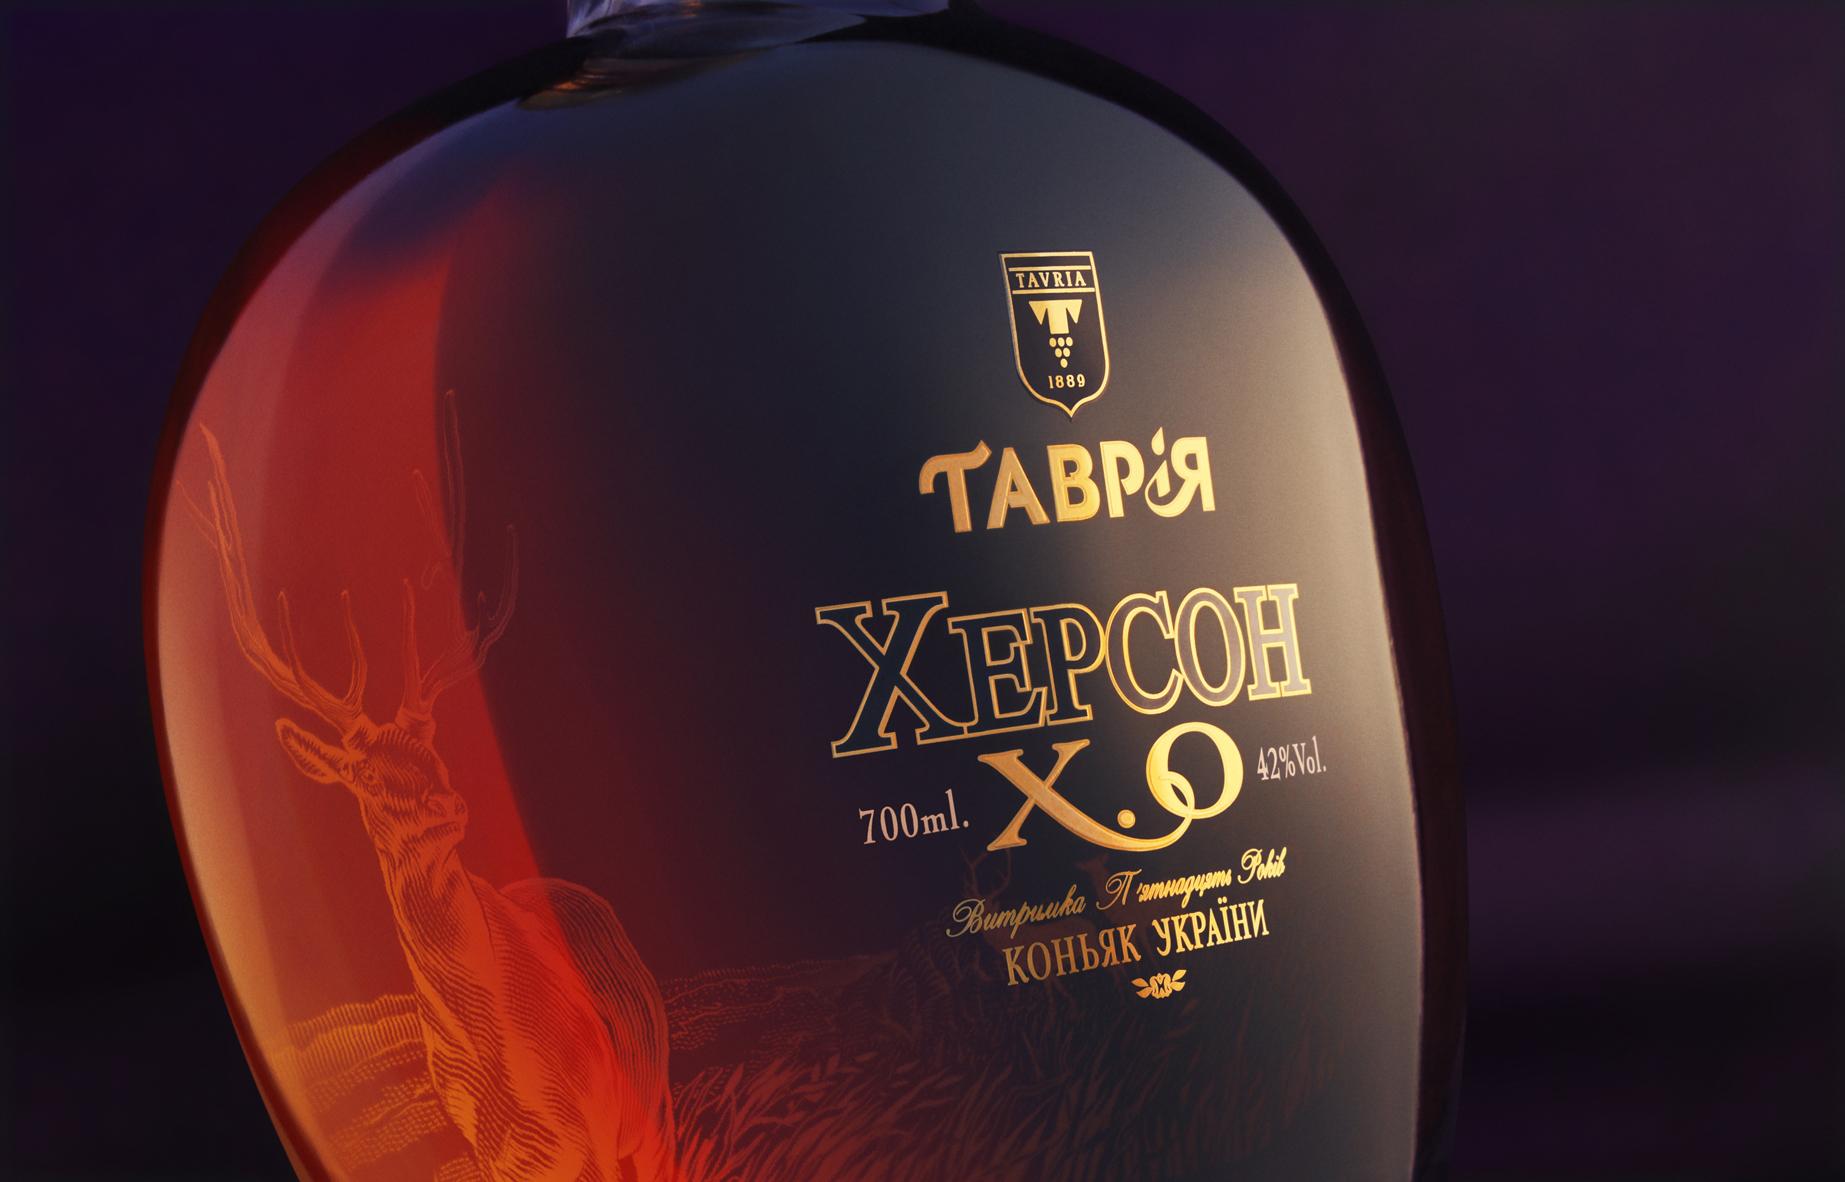 Krylia FMCG Branding Design Collector's Ukrainian Brandy Kherson 15 Year Old